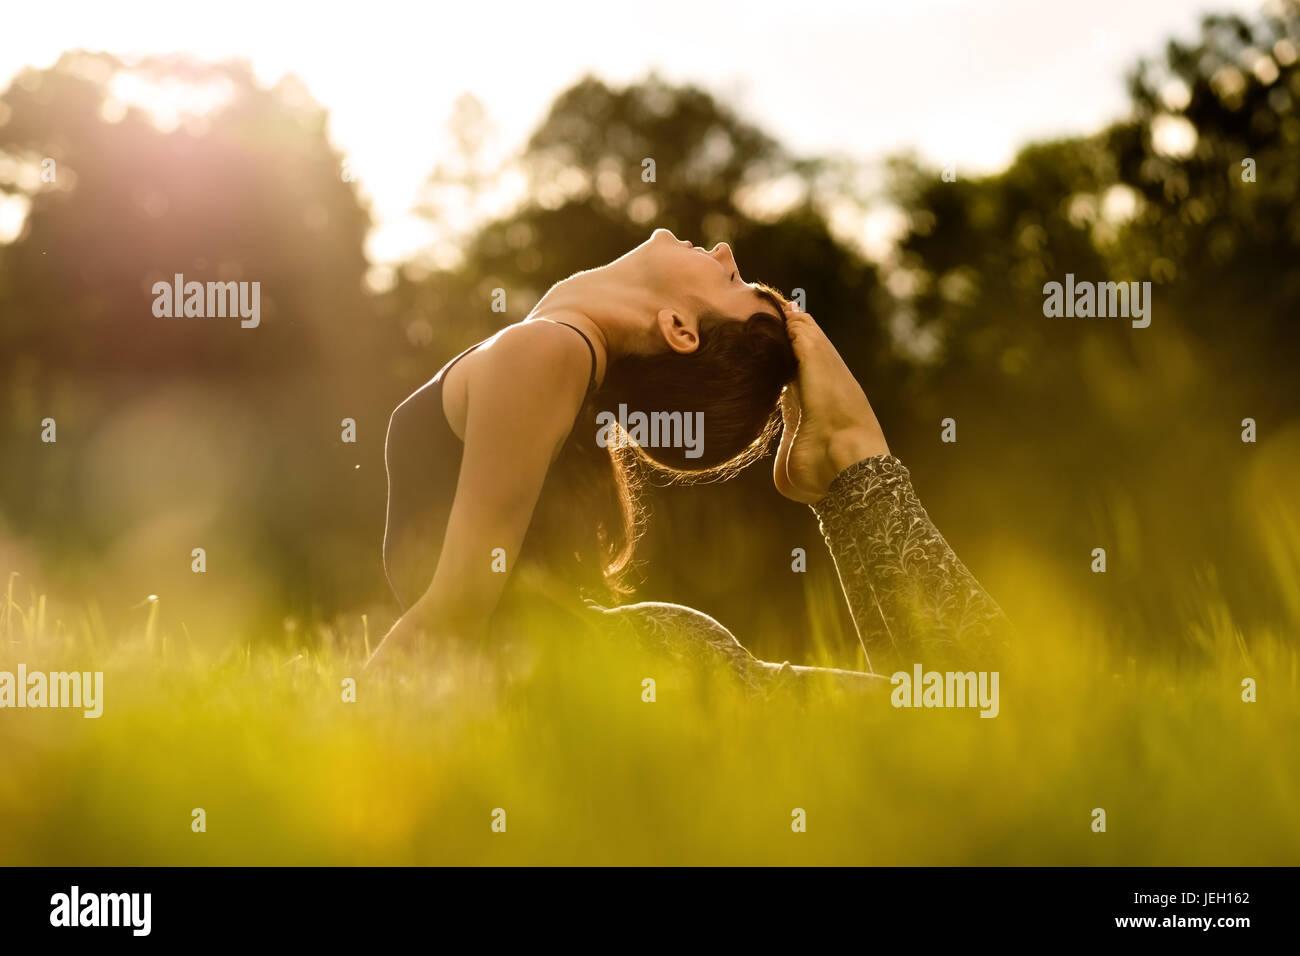 Yoga mujer en Green Park Imagen De Stock